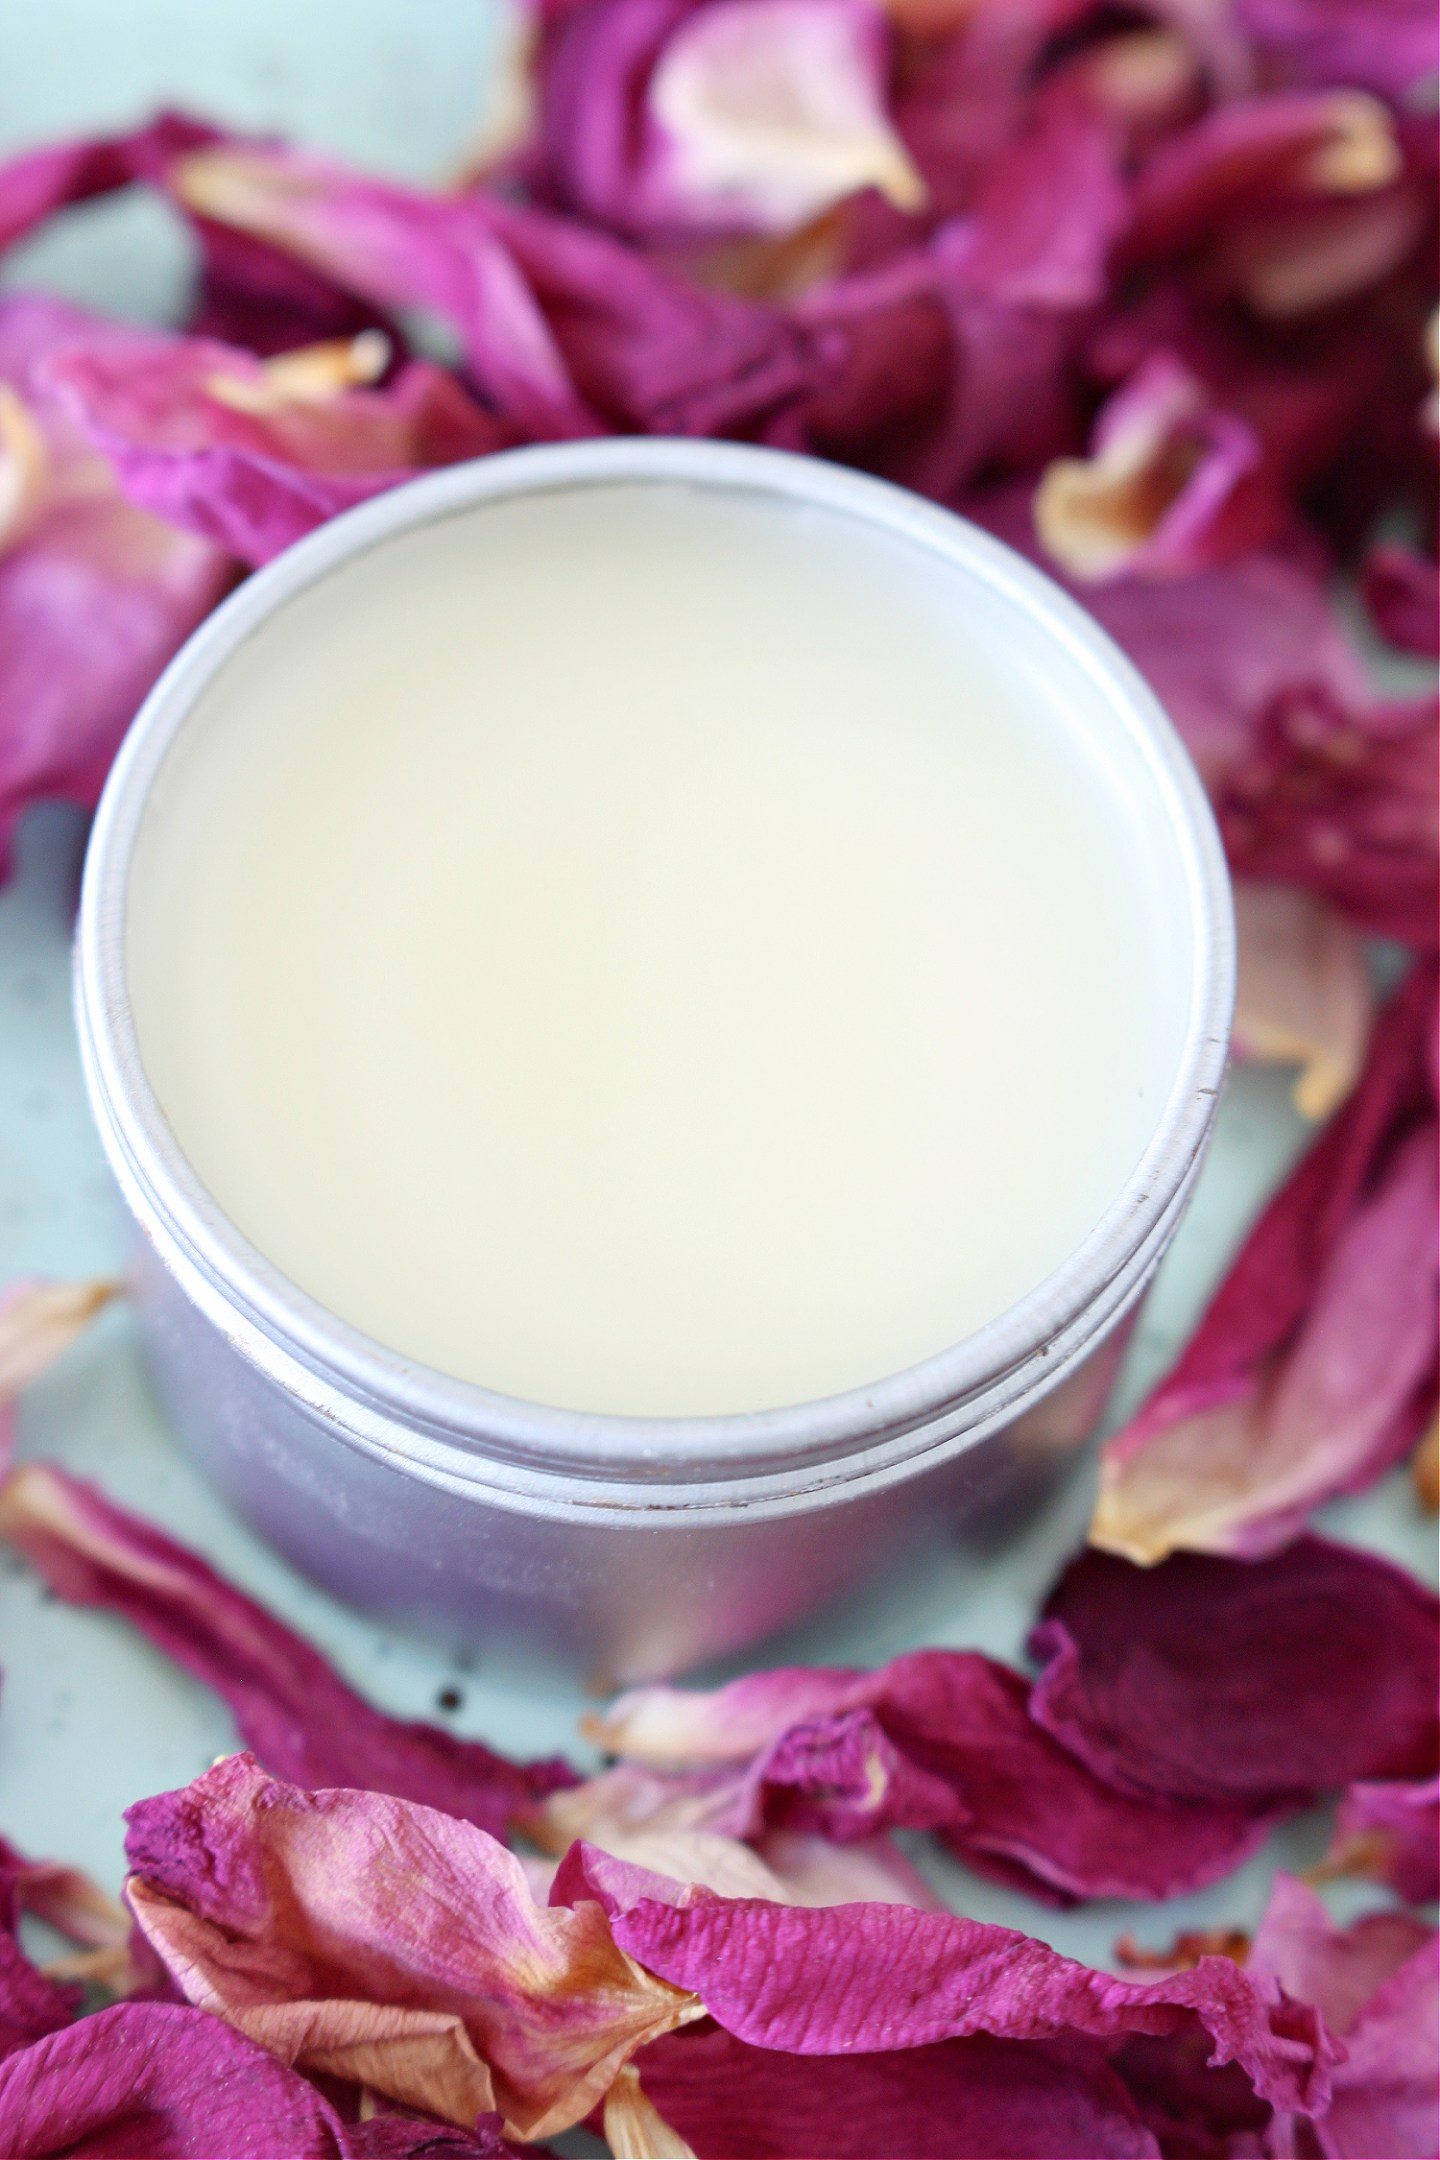 DIY Rose Petal Salve with Rose Petal Infused Oil